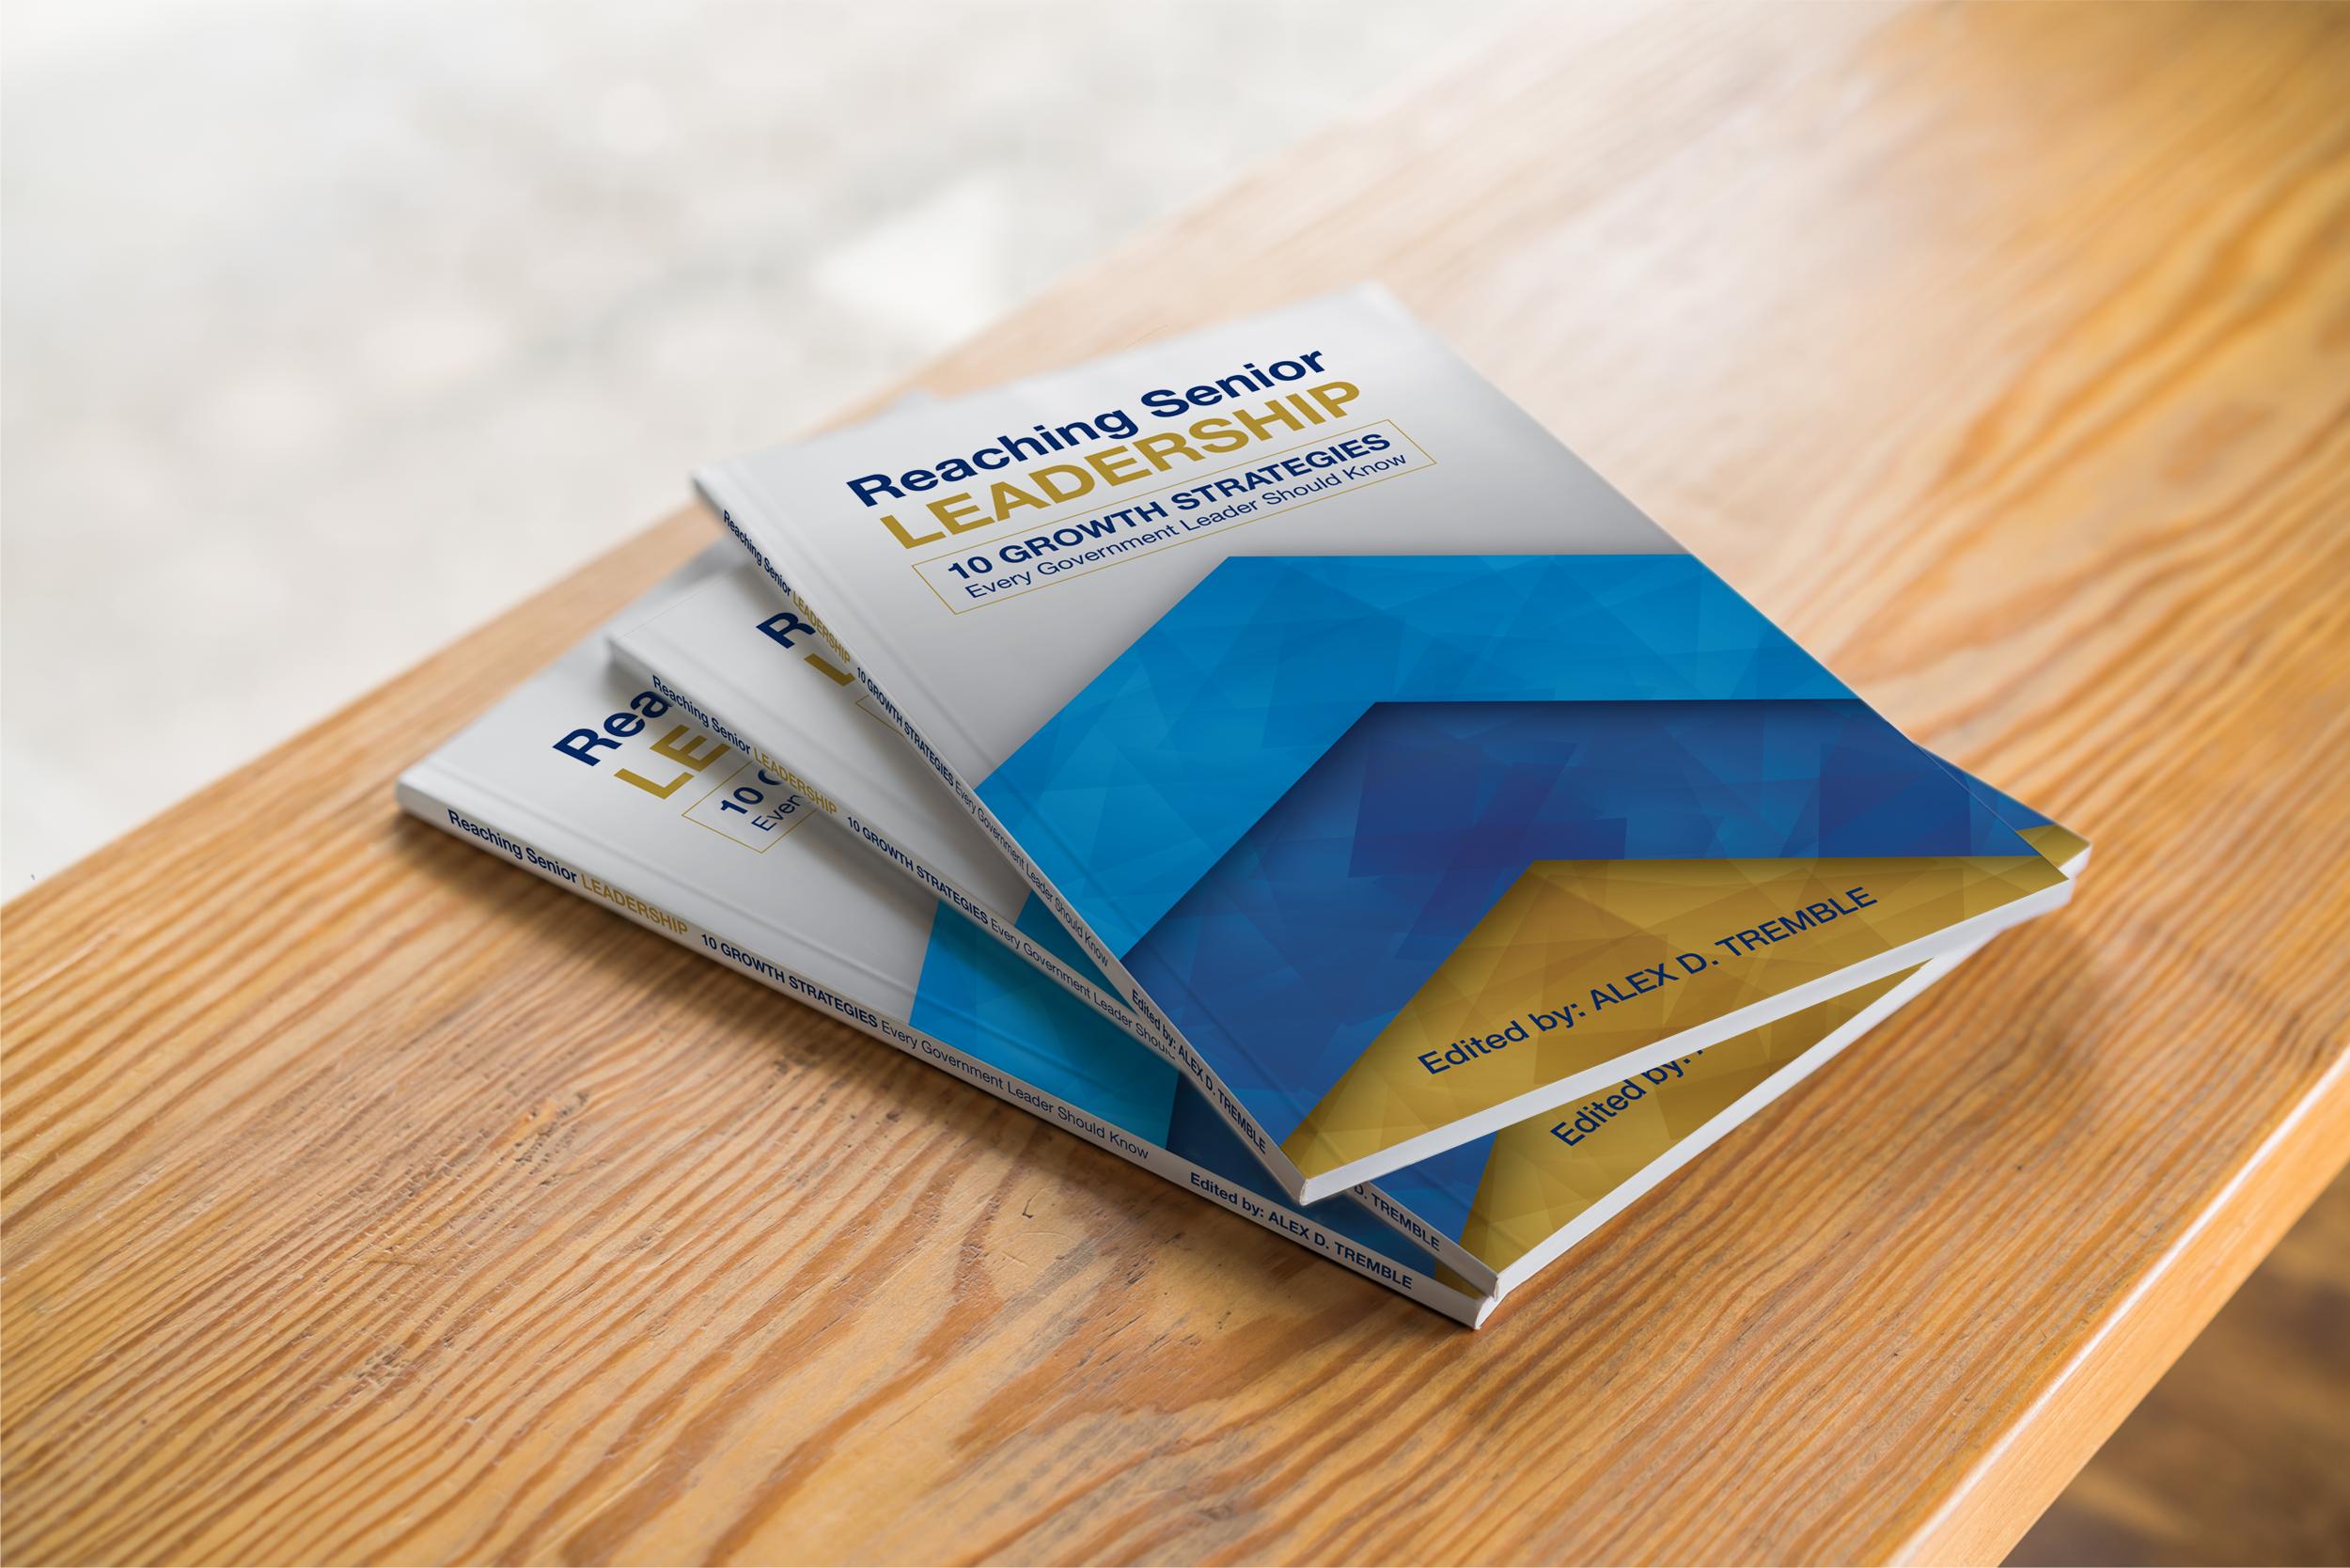 Reaching Senior Leadership book cover